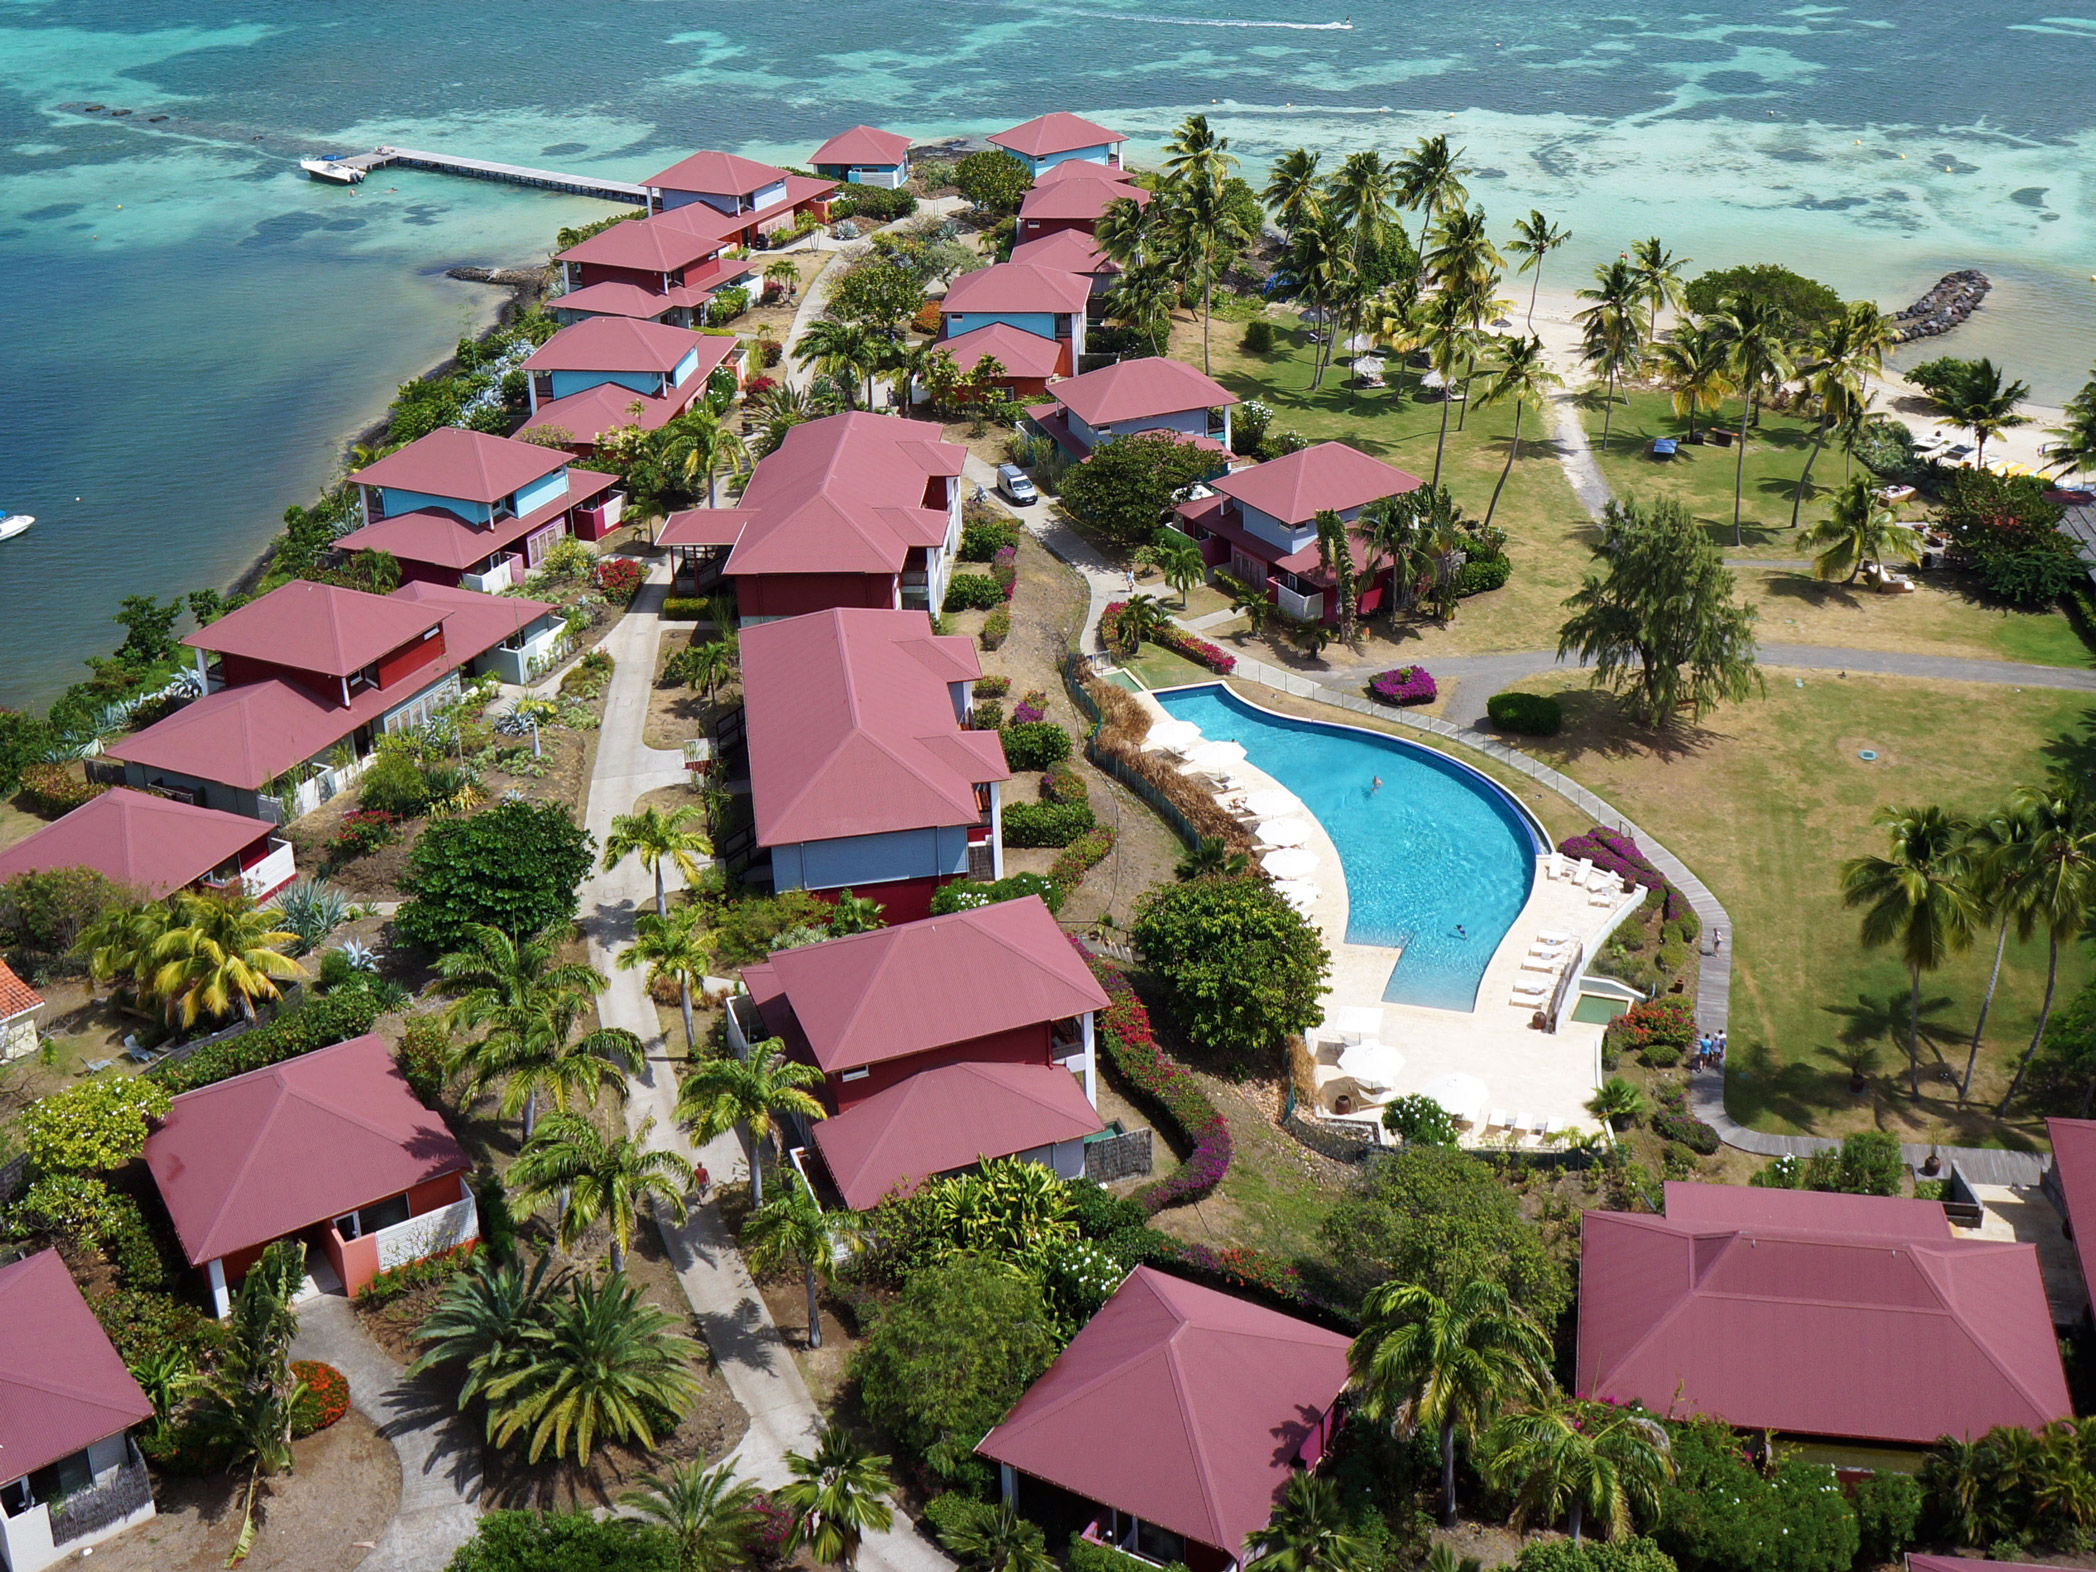 cap est lagoon resort spa martinique transat. Black Bedroom Furniture Sets. Home Design Ideas